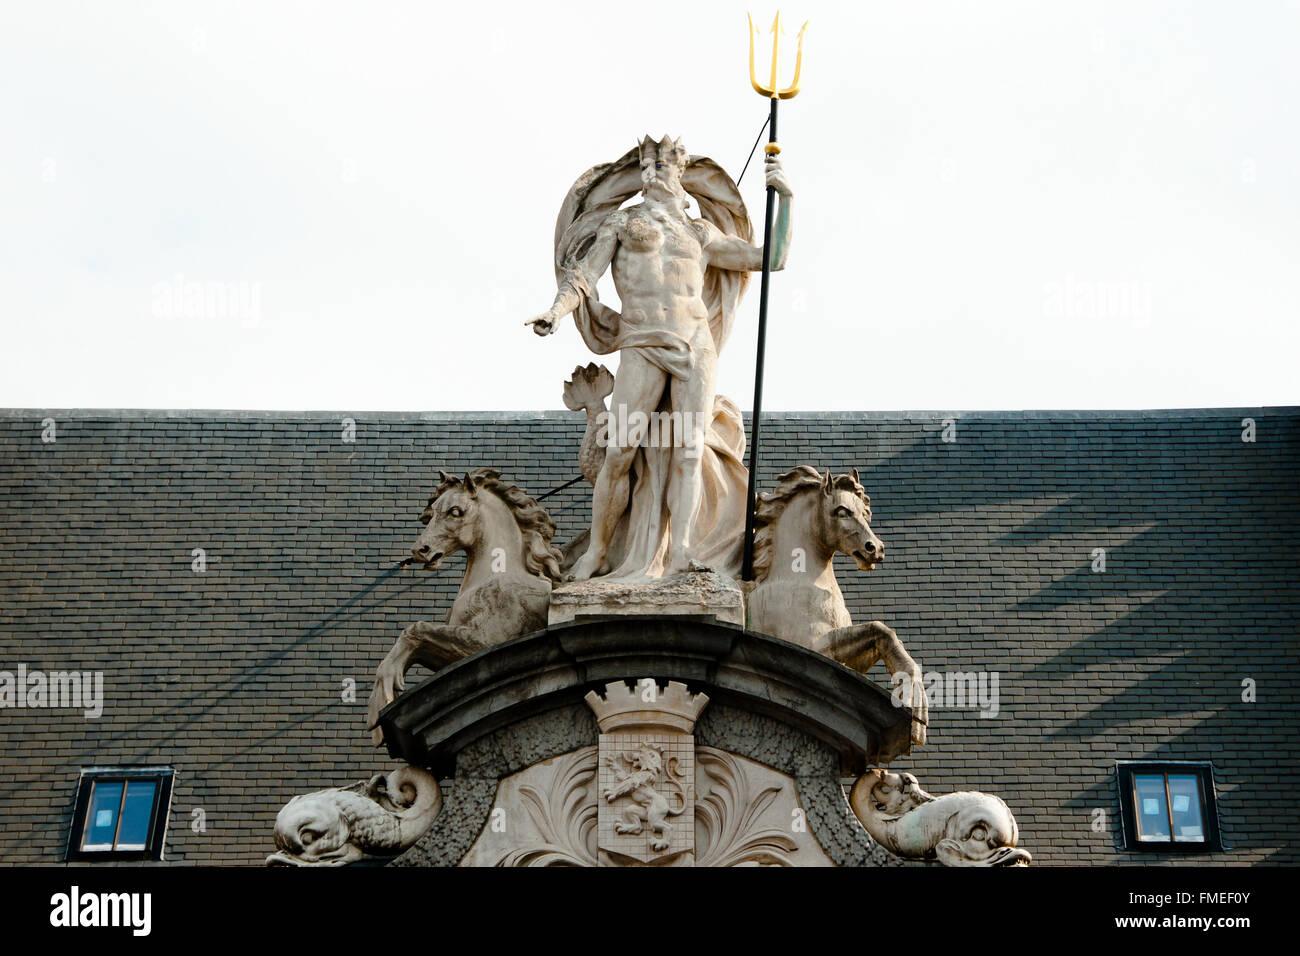 Poseidon Statue - Stock Image